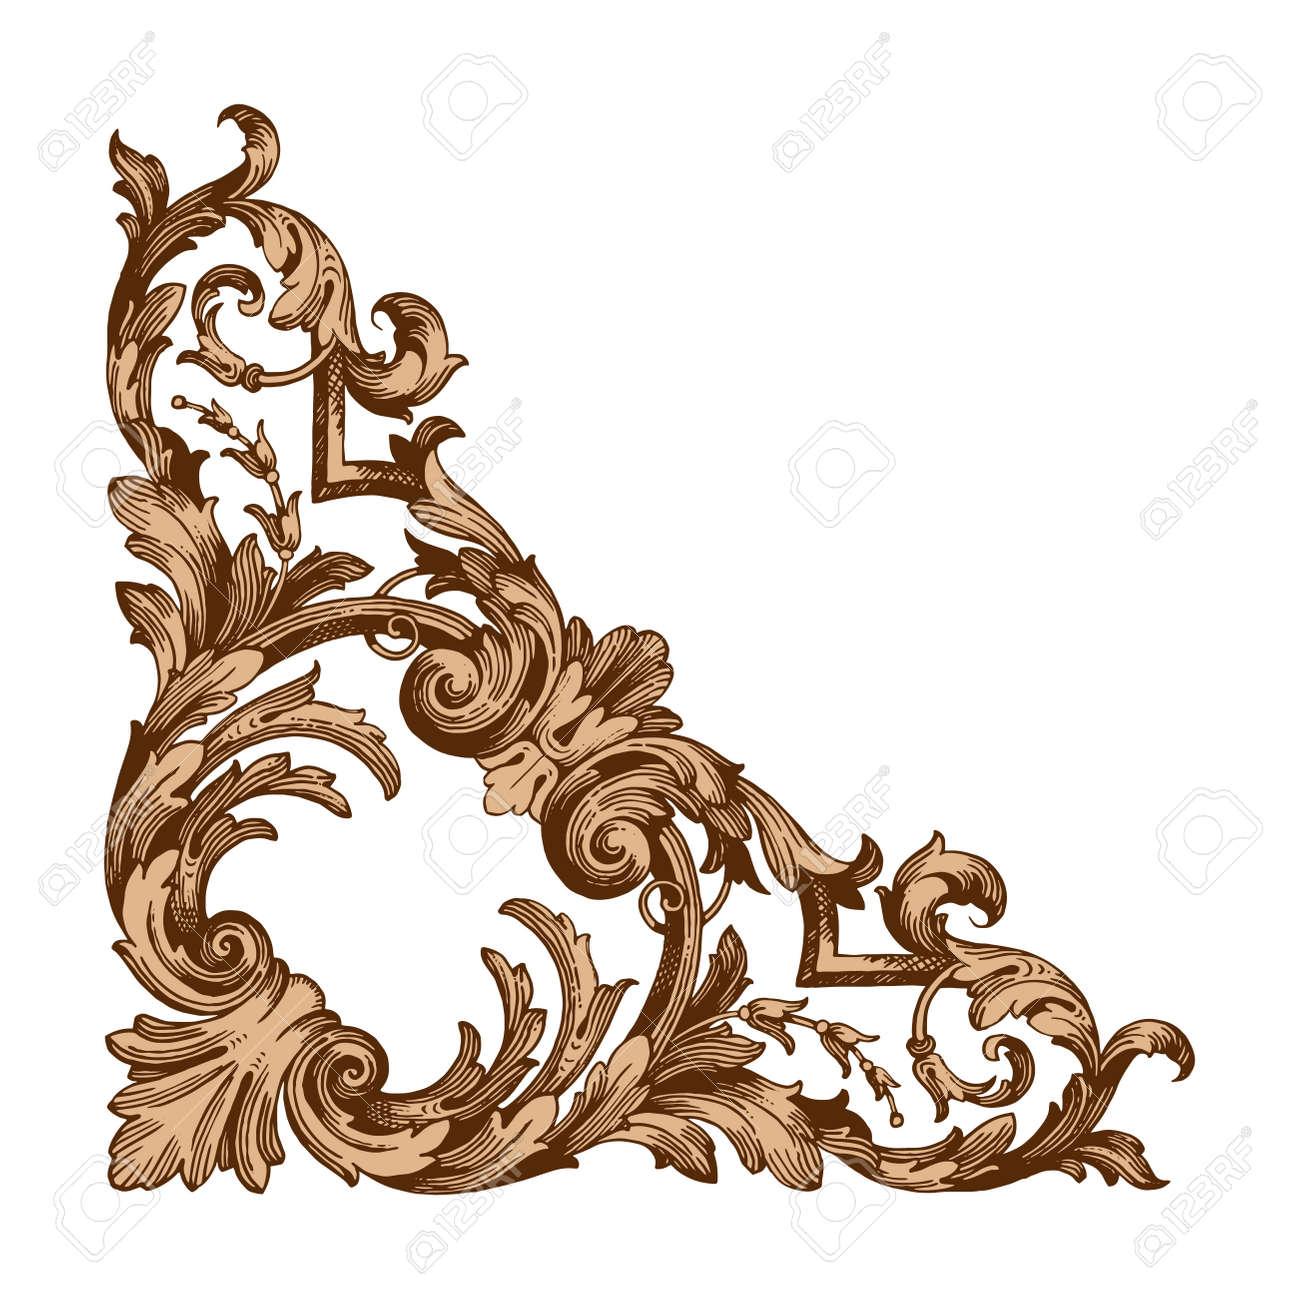 classical baroque vector of vintage elements for design decorative rh 123rf com filigree vector image vector filigree border